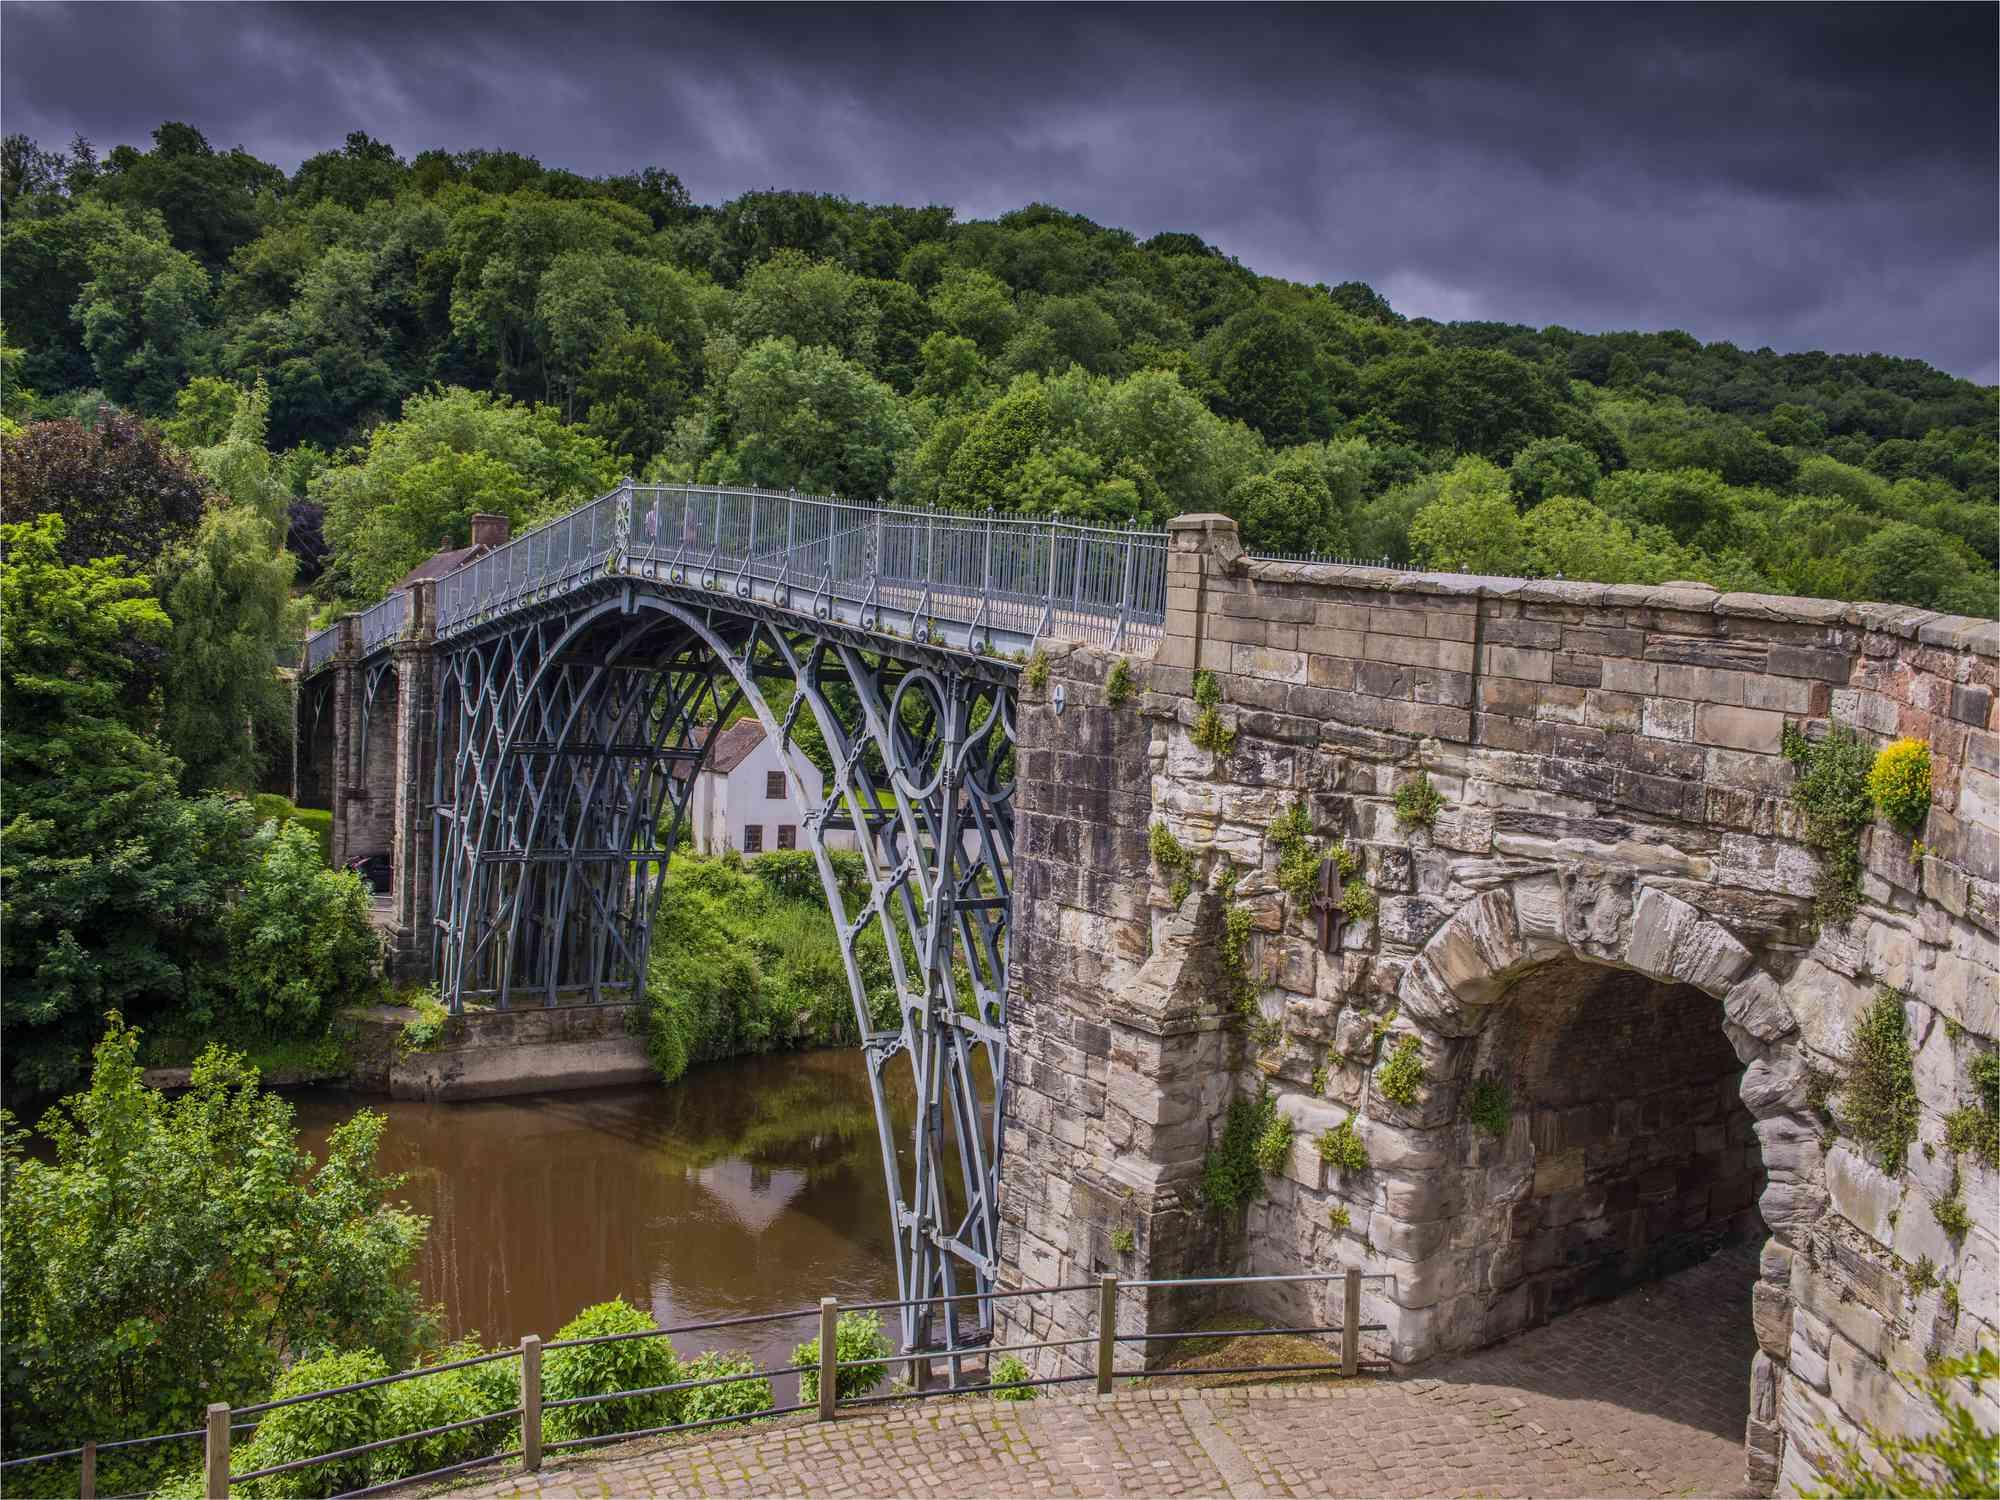 The Iron Bridge at Severn Shropshire, England